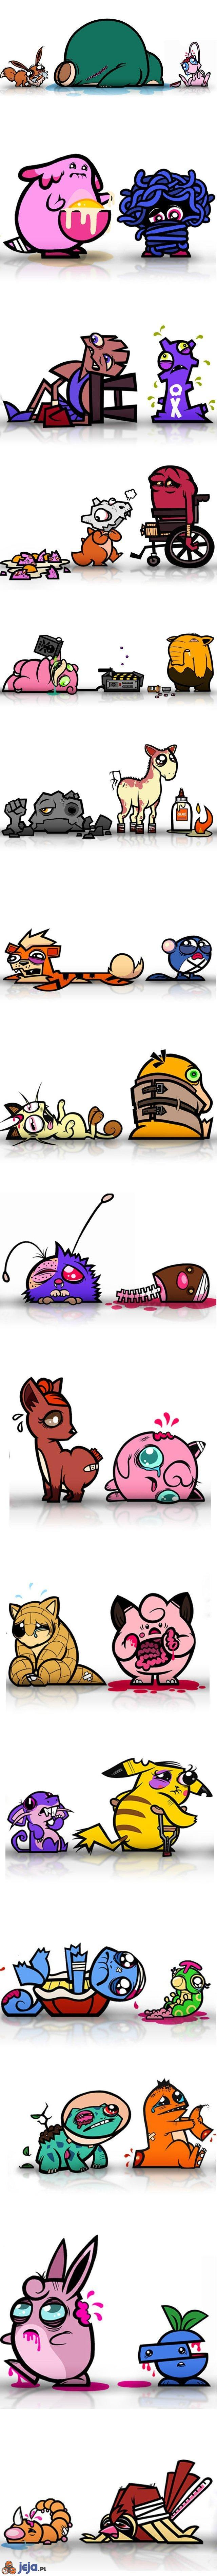 Pokemony po walkach